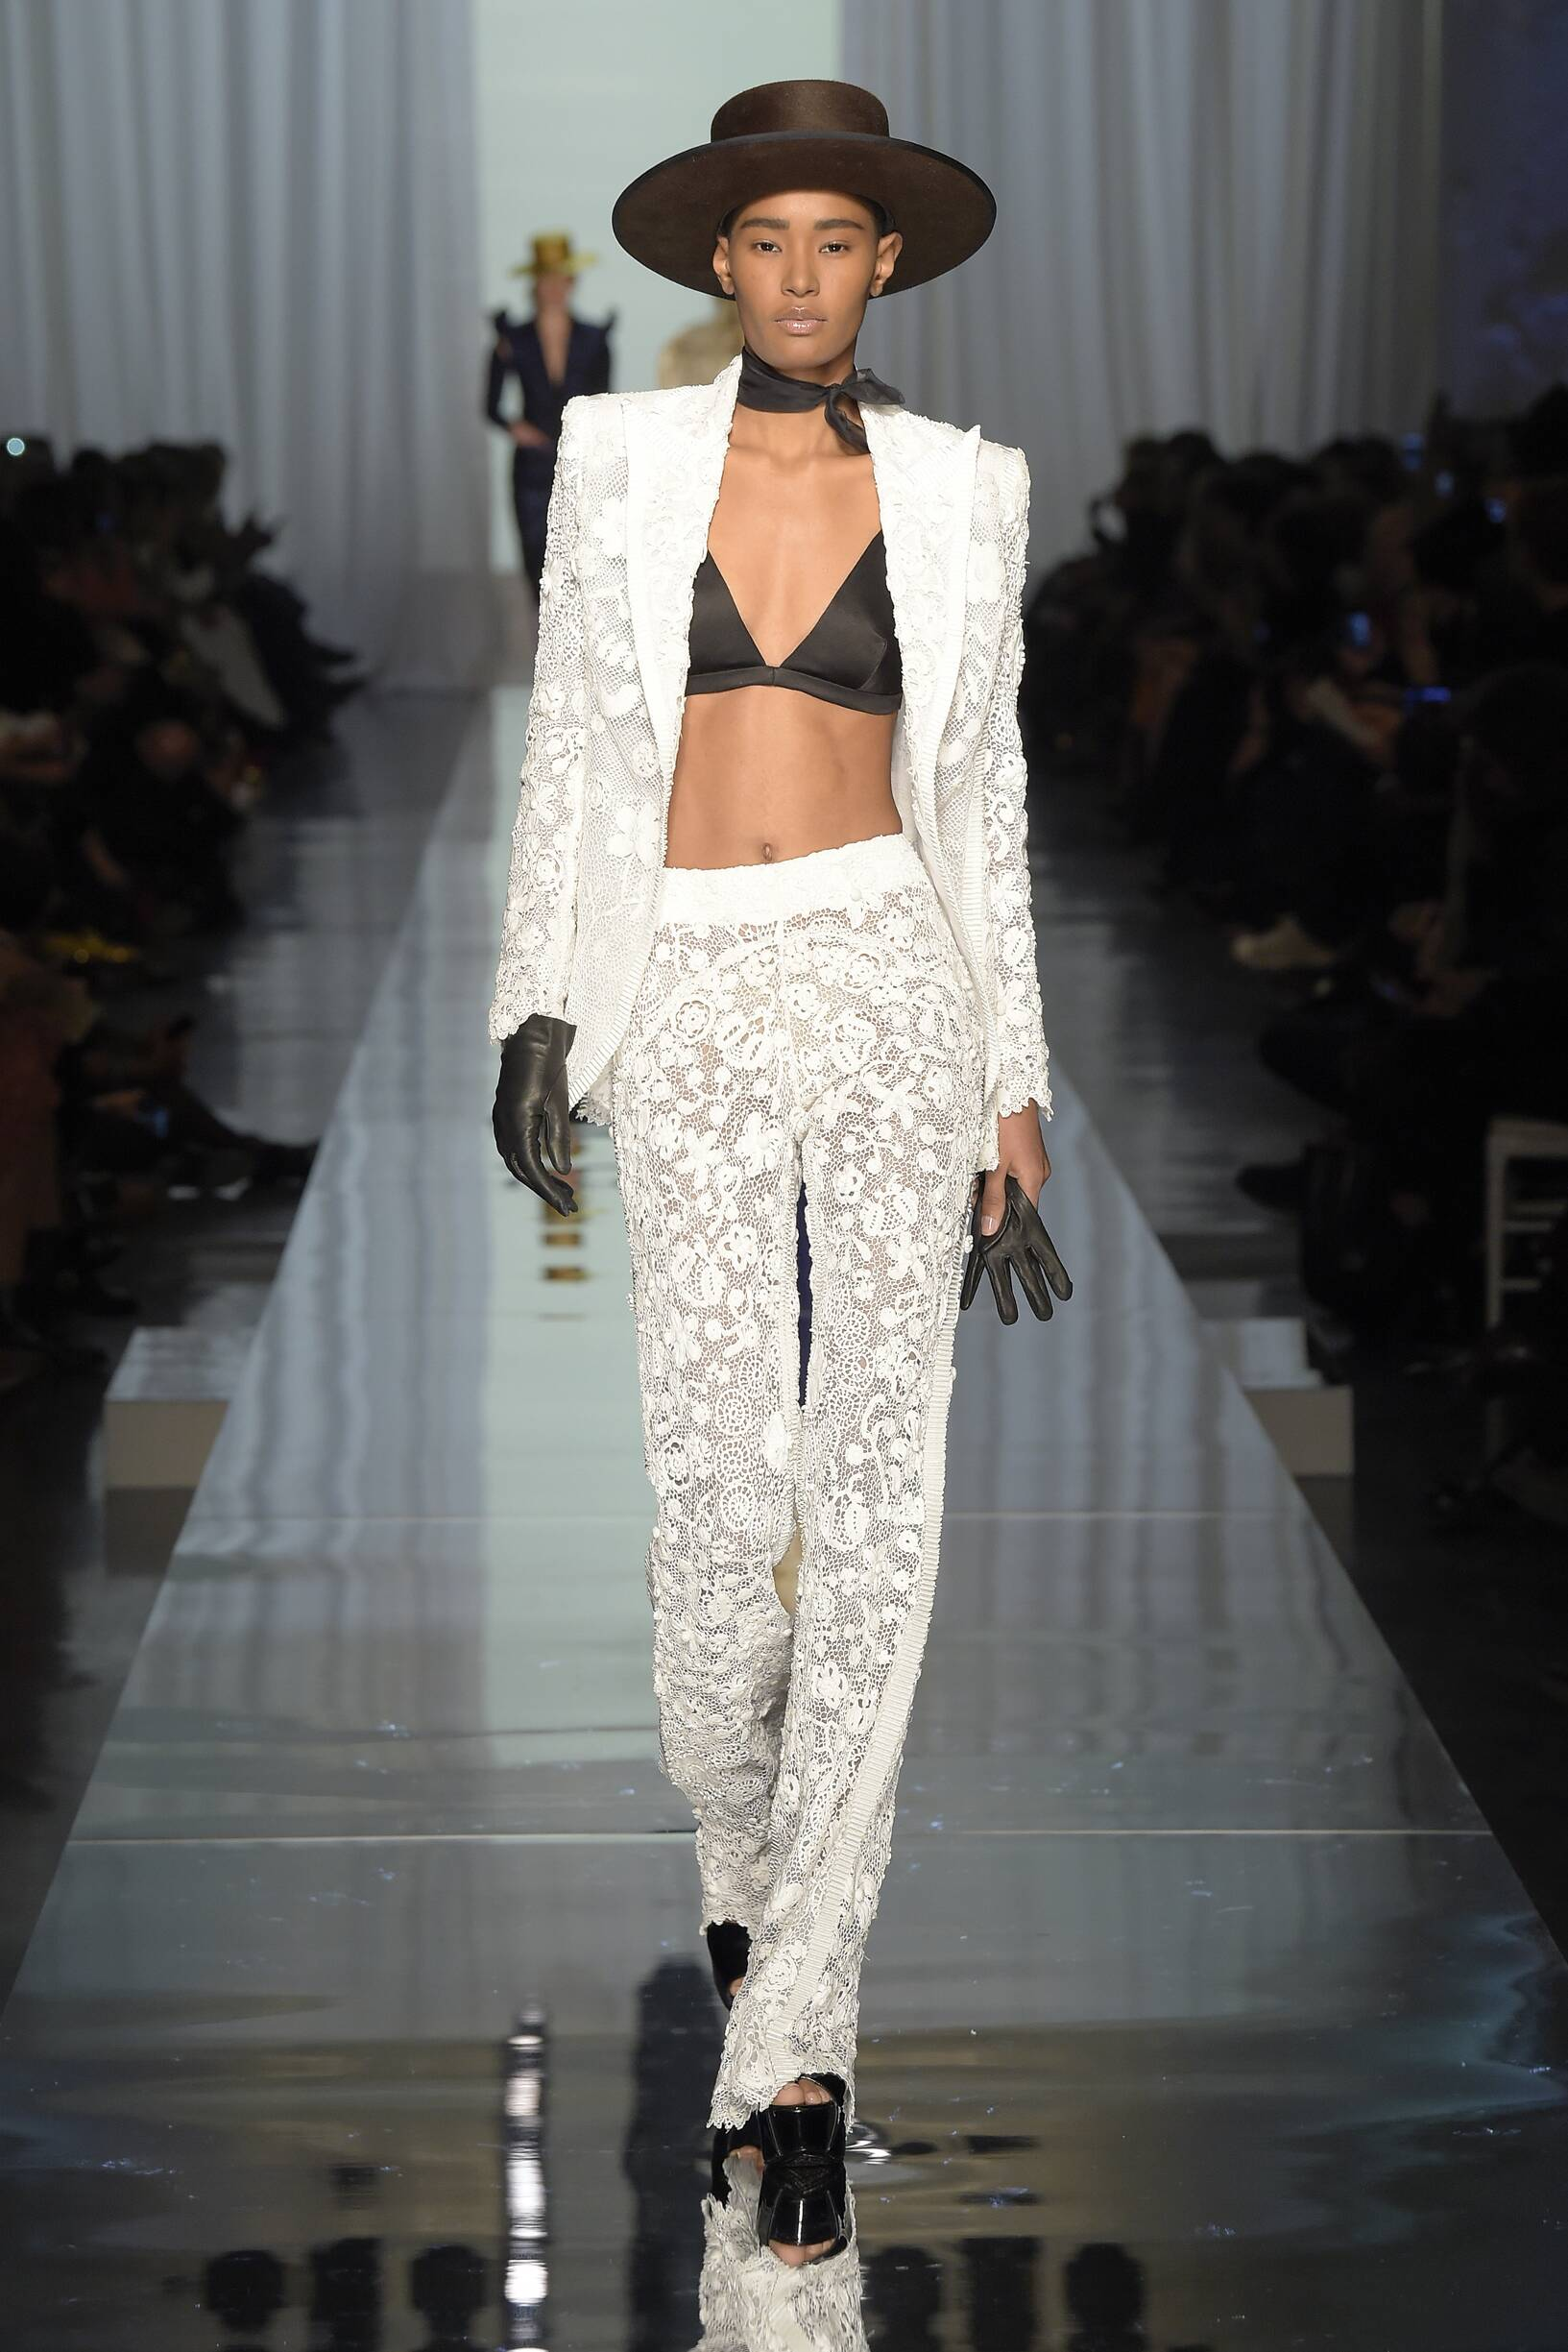 Jean Paul Gaultier Haute Couture Paris Fashion Week Womenswear